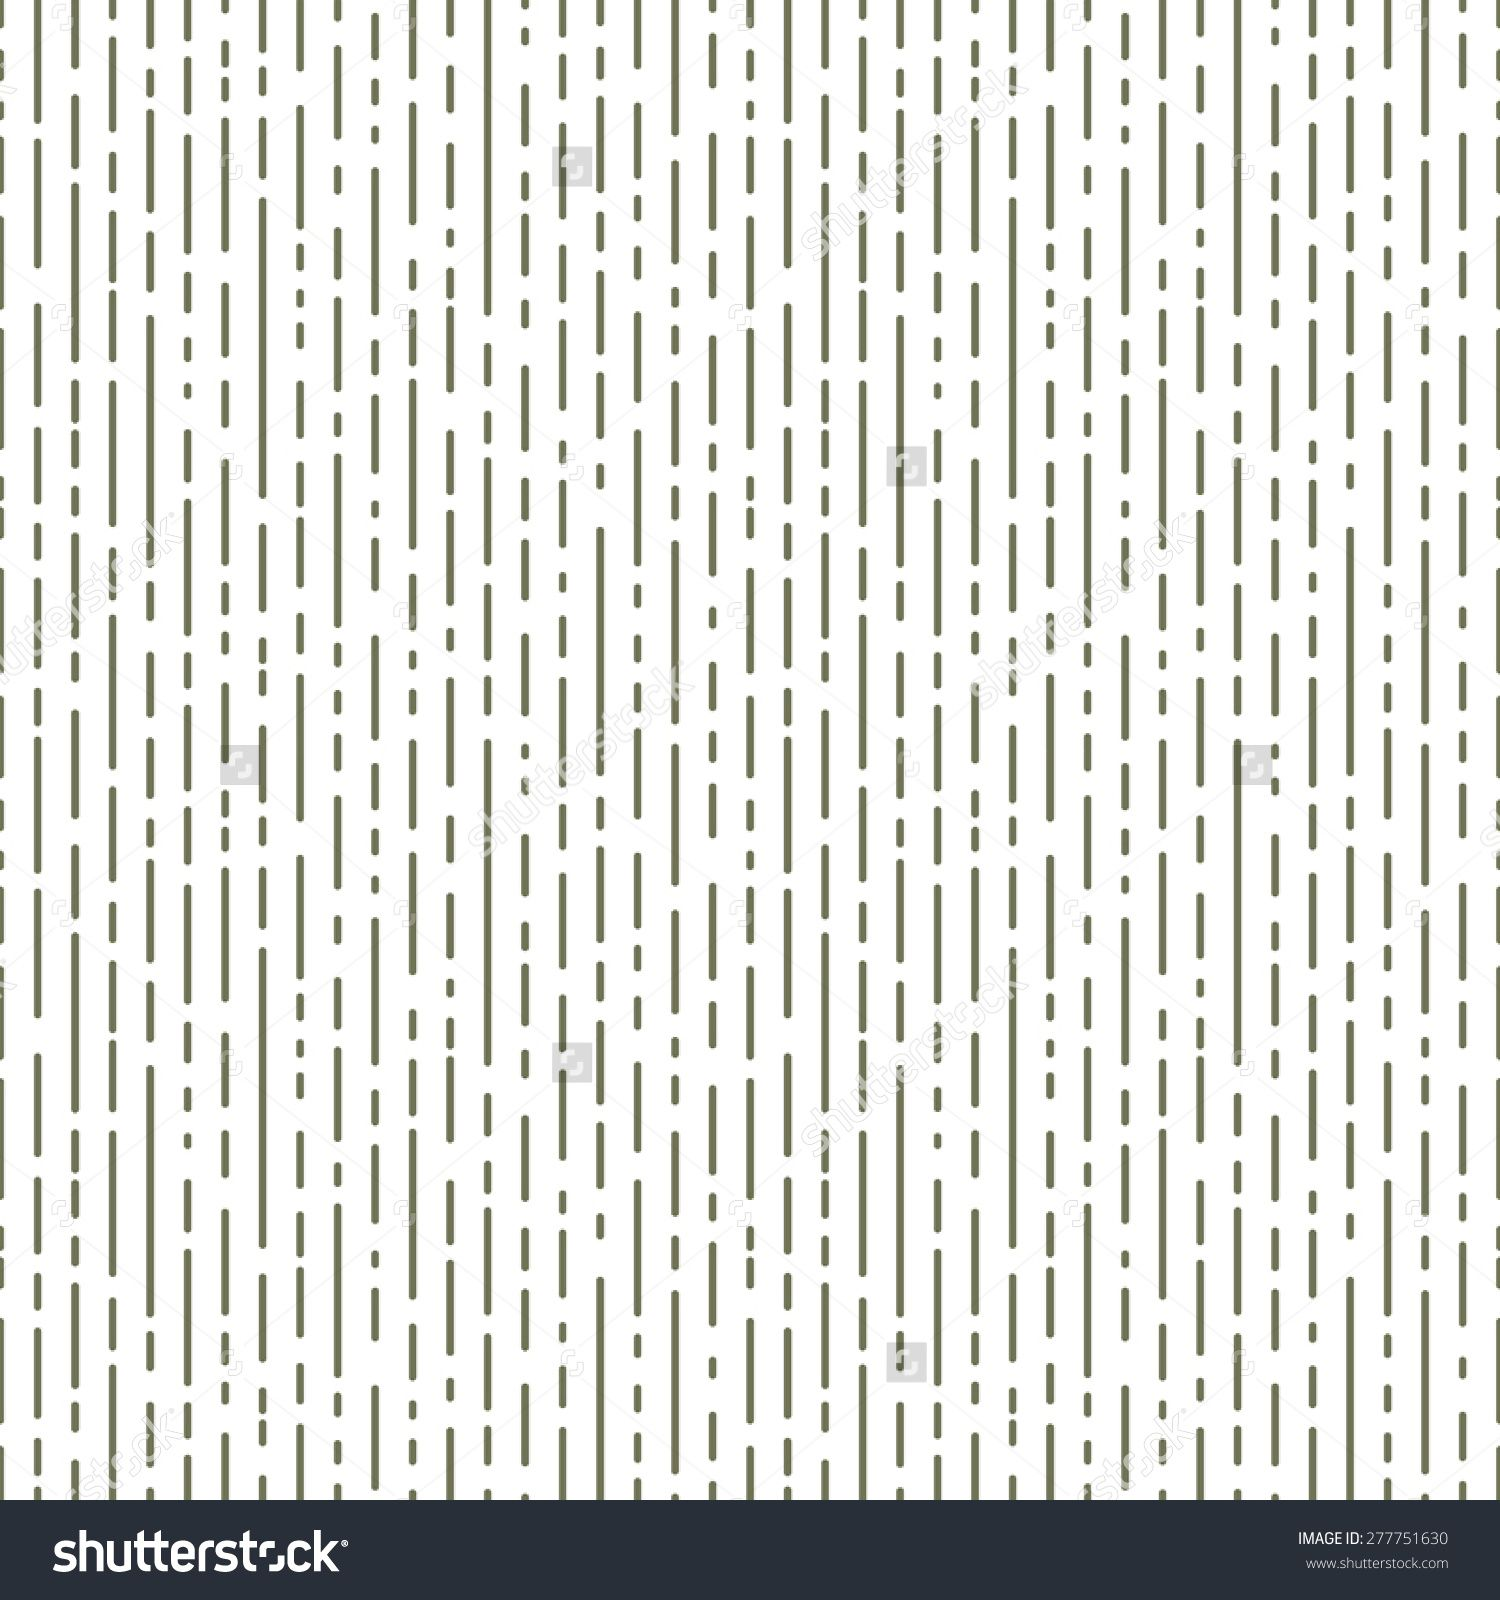 Dashed Lines Texture On Transparent Background Ultra Light Variant Line Texture Transparent Background Texture